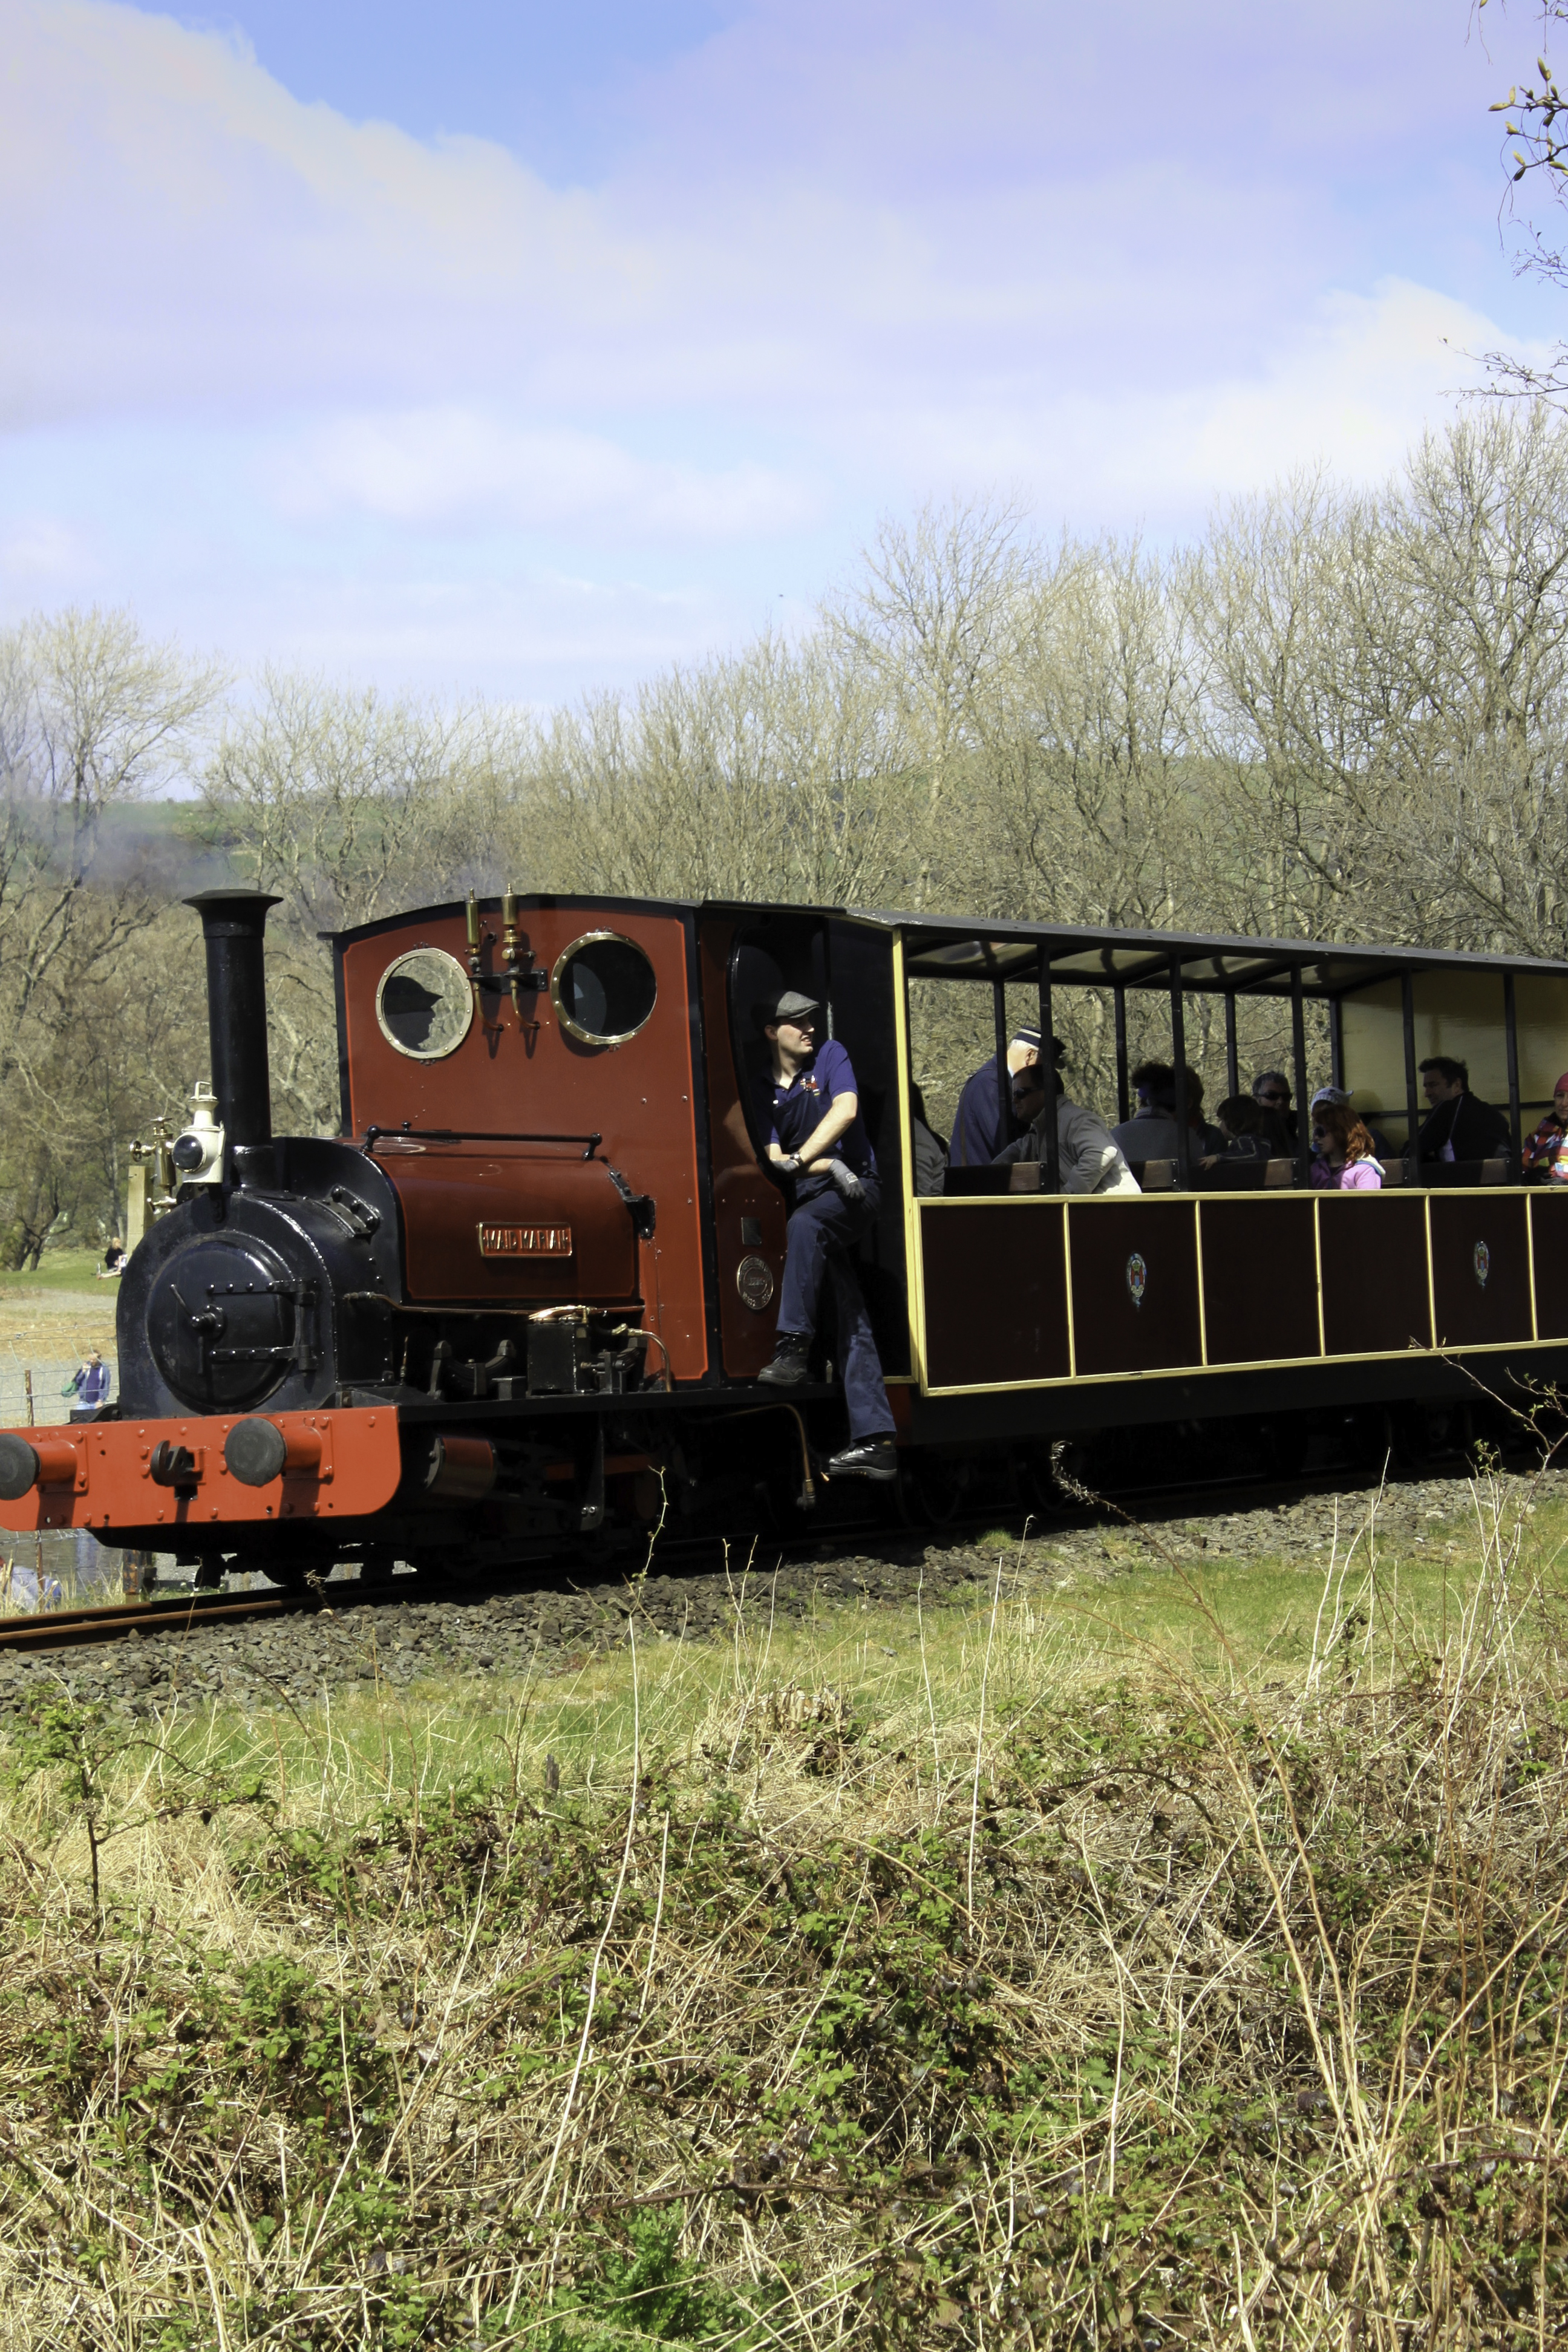 Ride on the Bala Lake Railway